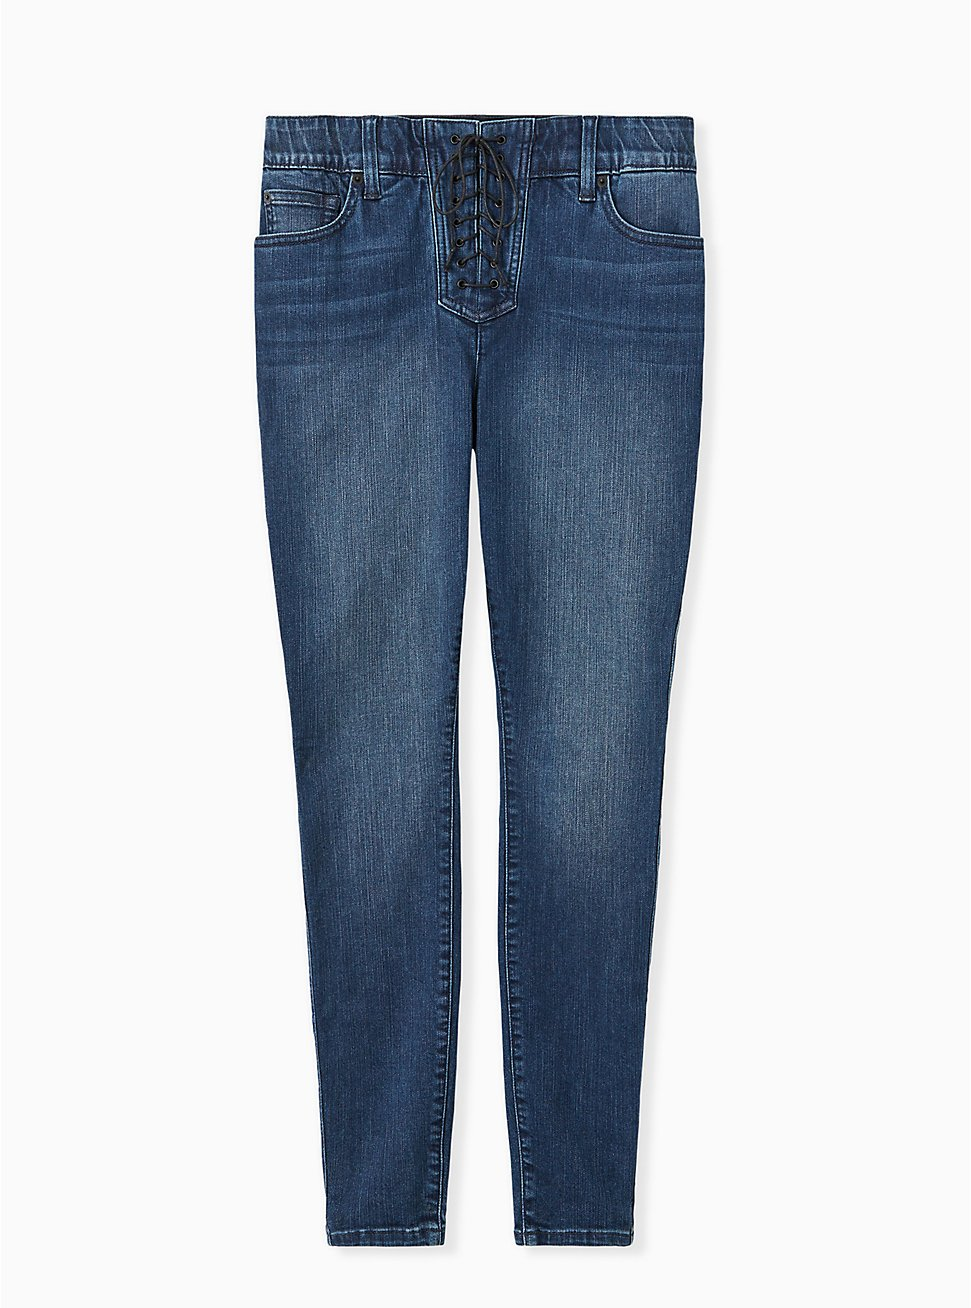 Plus Size Bombshell Skinny Jean - Premium Stretch Medium Wash , THAMES, hi-res